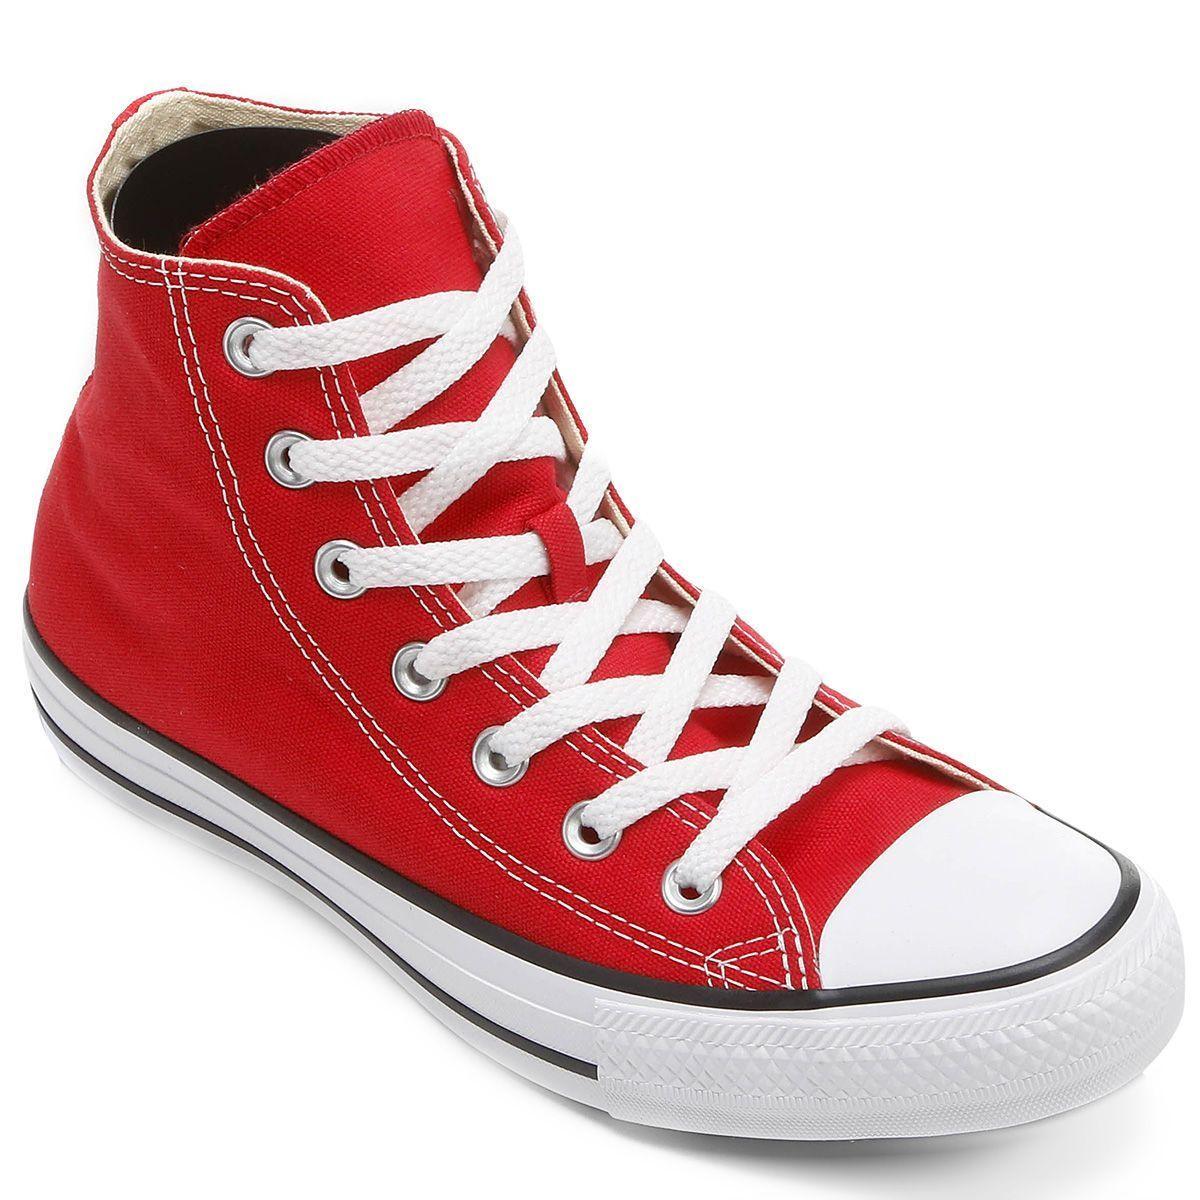 Tênis Cano Alto Converse Chuck Taylor All Star HI / Vermelho - Branco